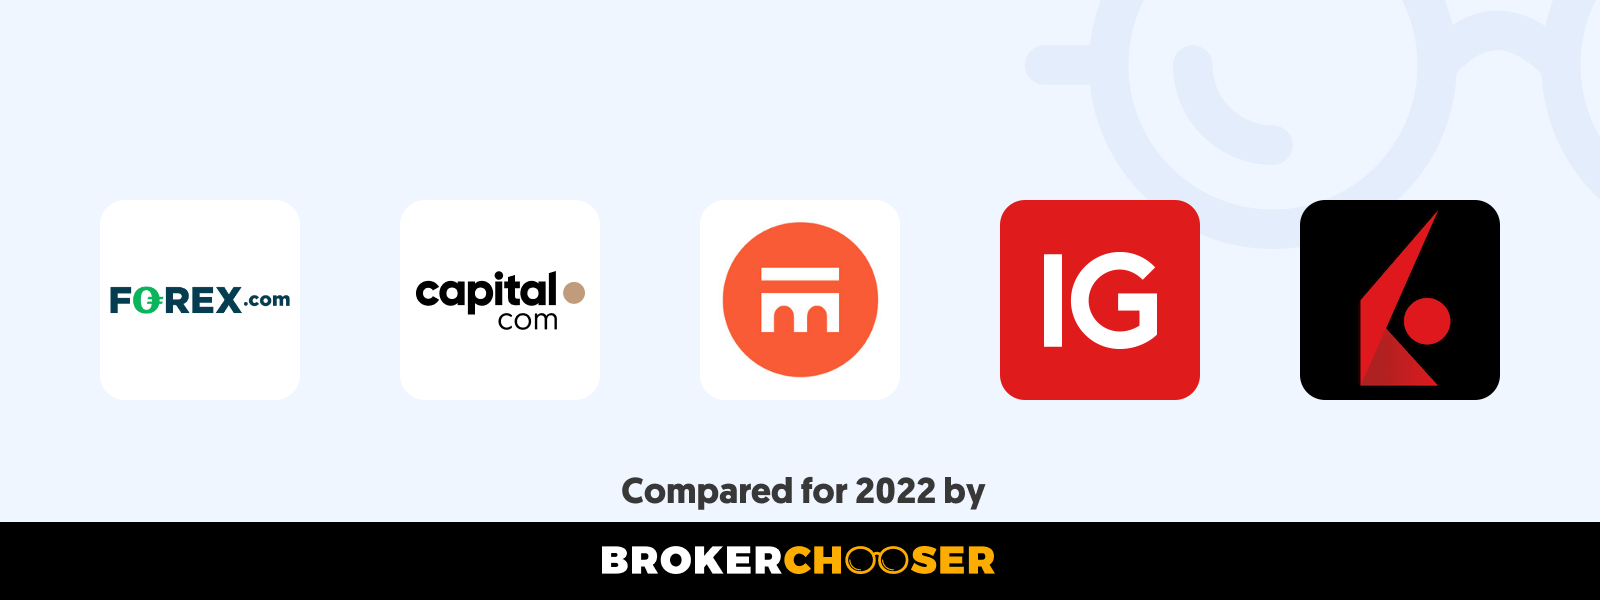 Best forex brokers for beginners in Belize in 2021